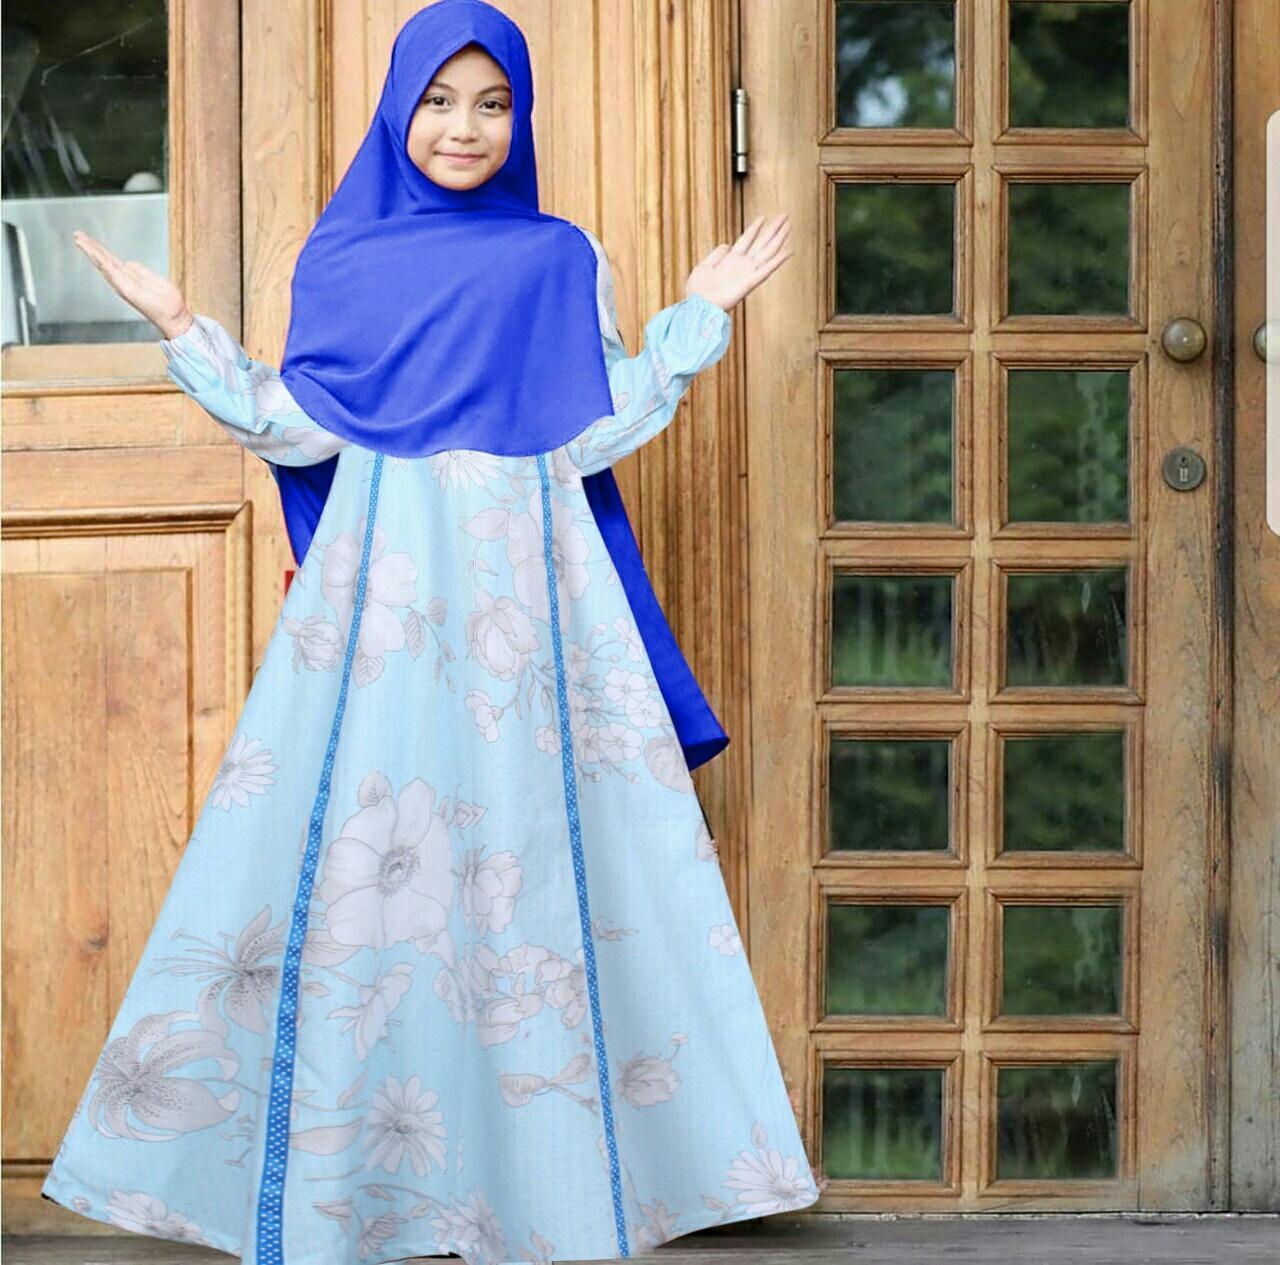 Liliana Baju Gamis  Untuk Anak 6-8thn  Fashion  Terbaru Wanita